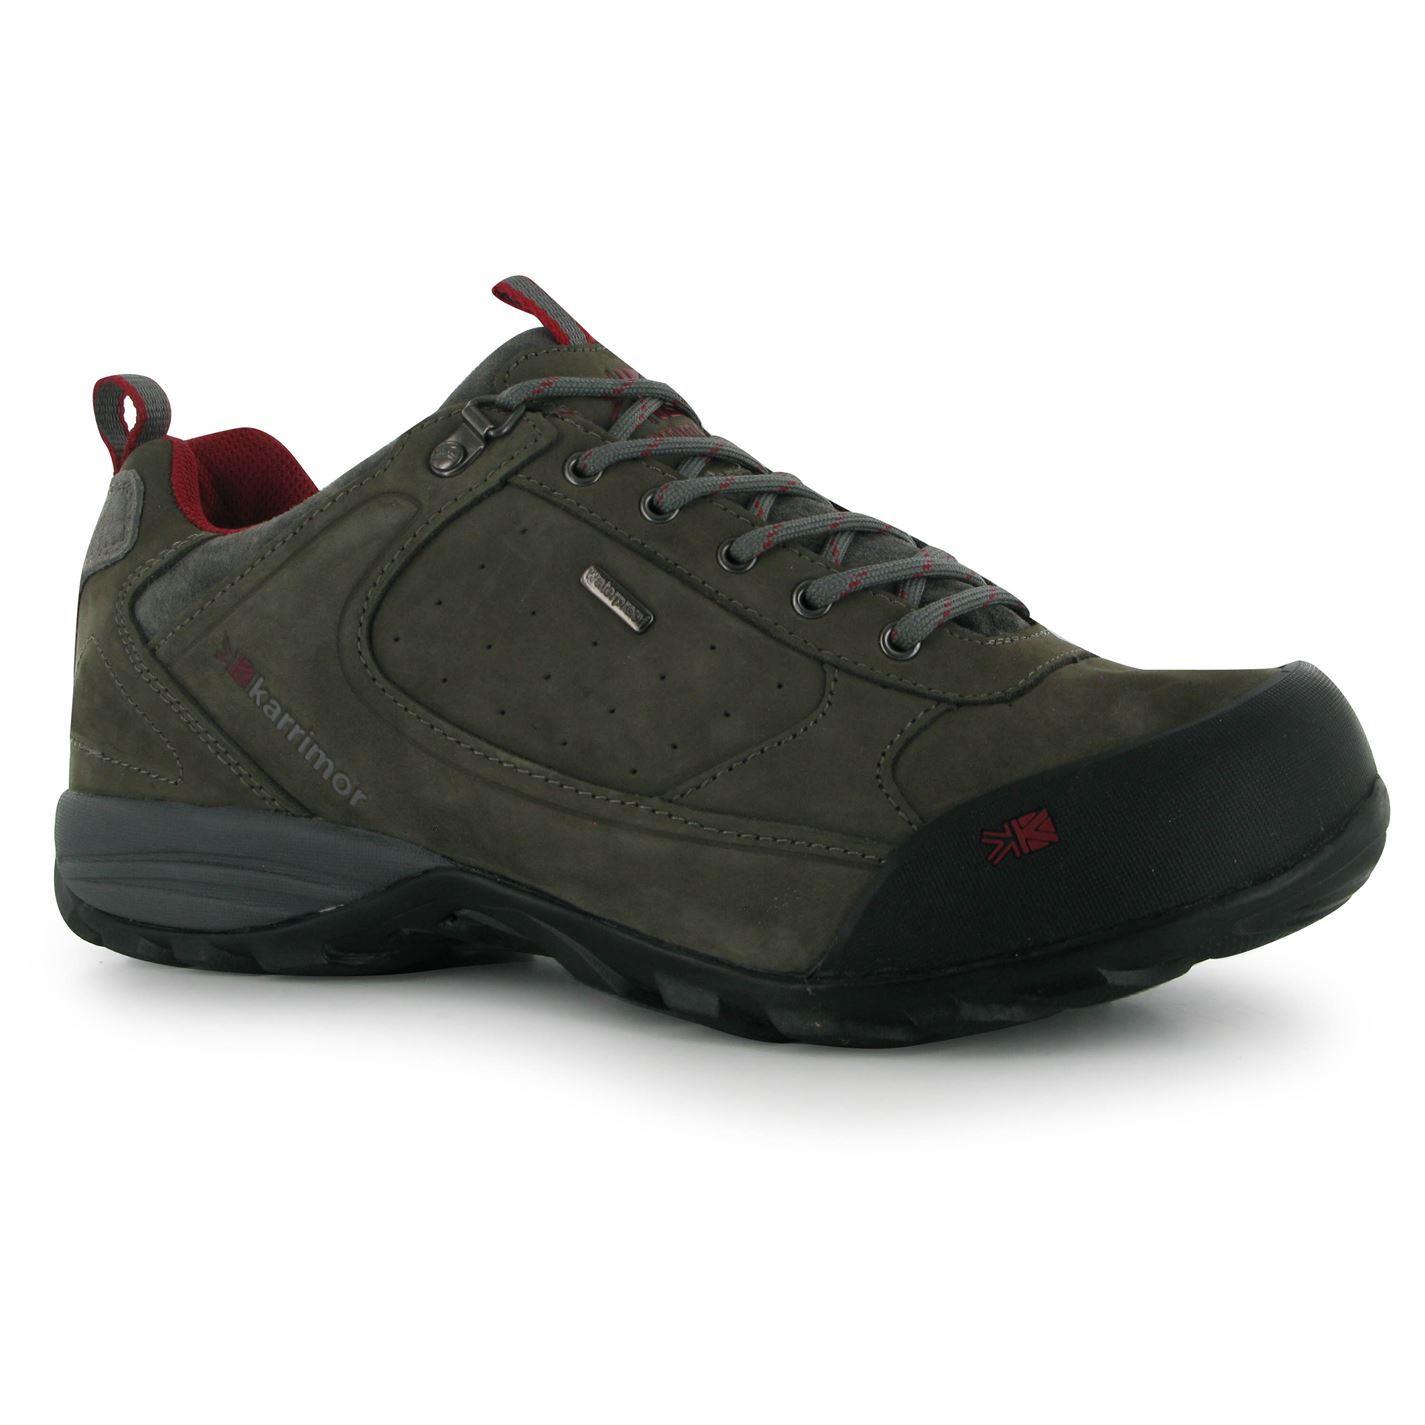 Supra Footwear France Avis